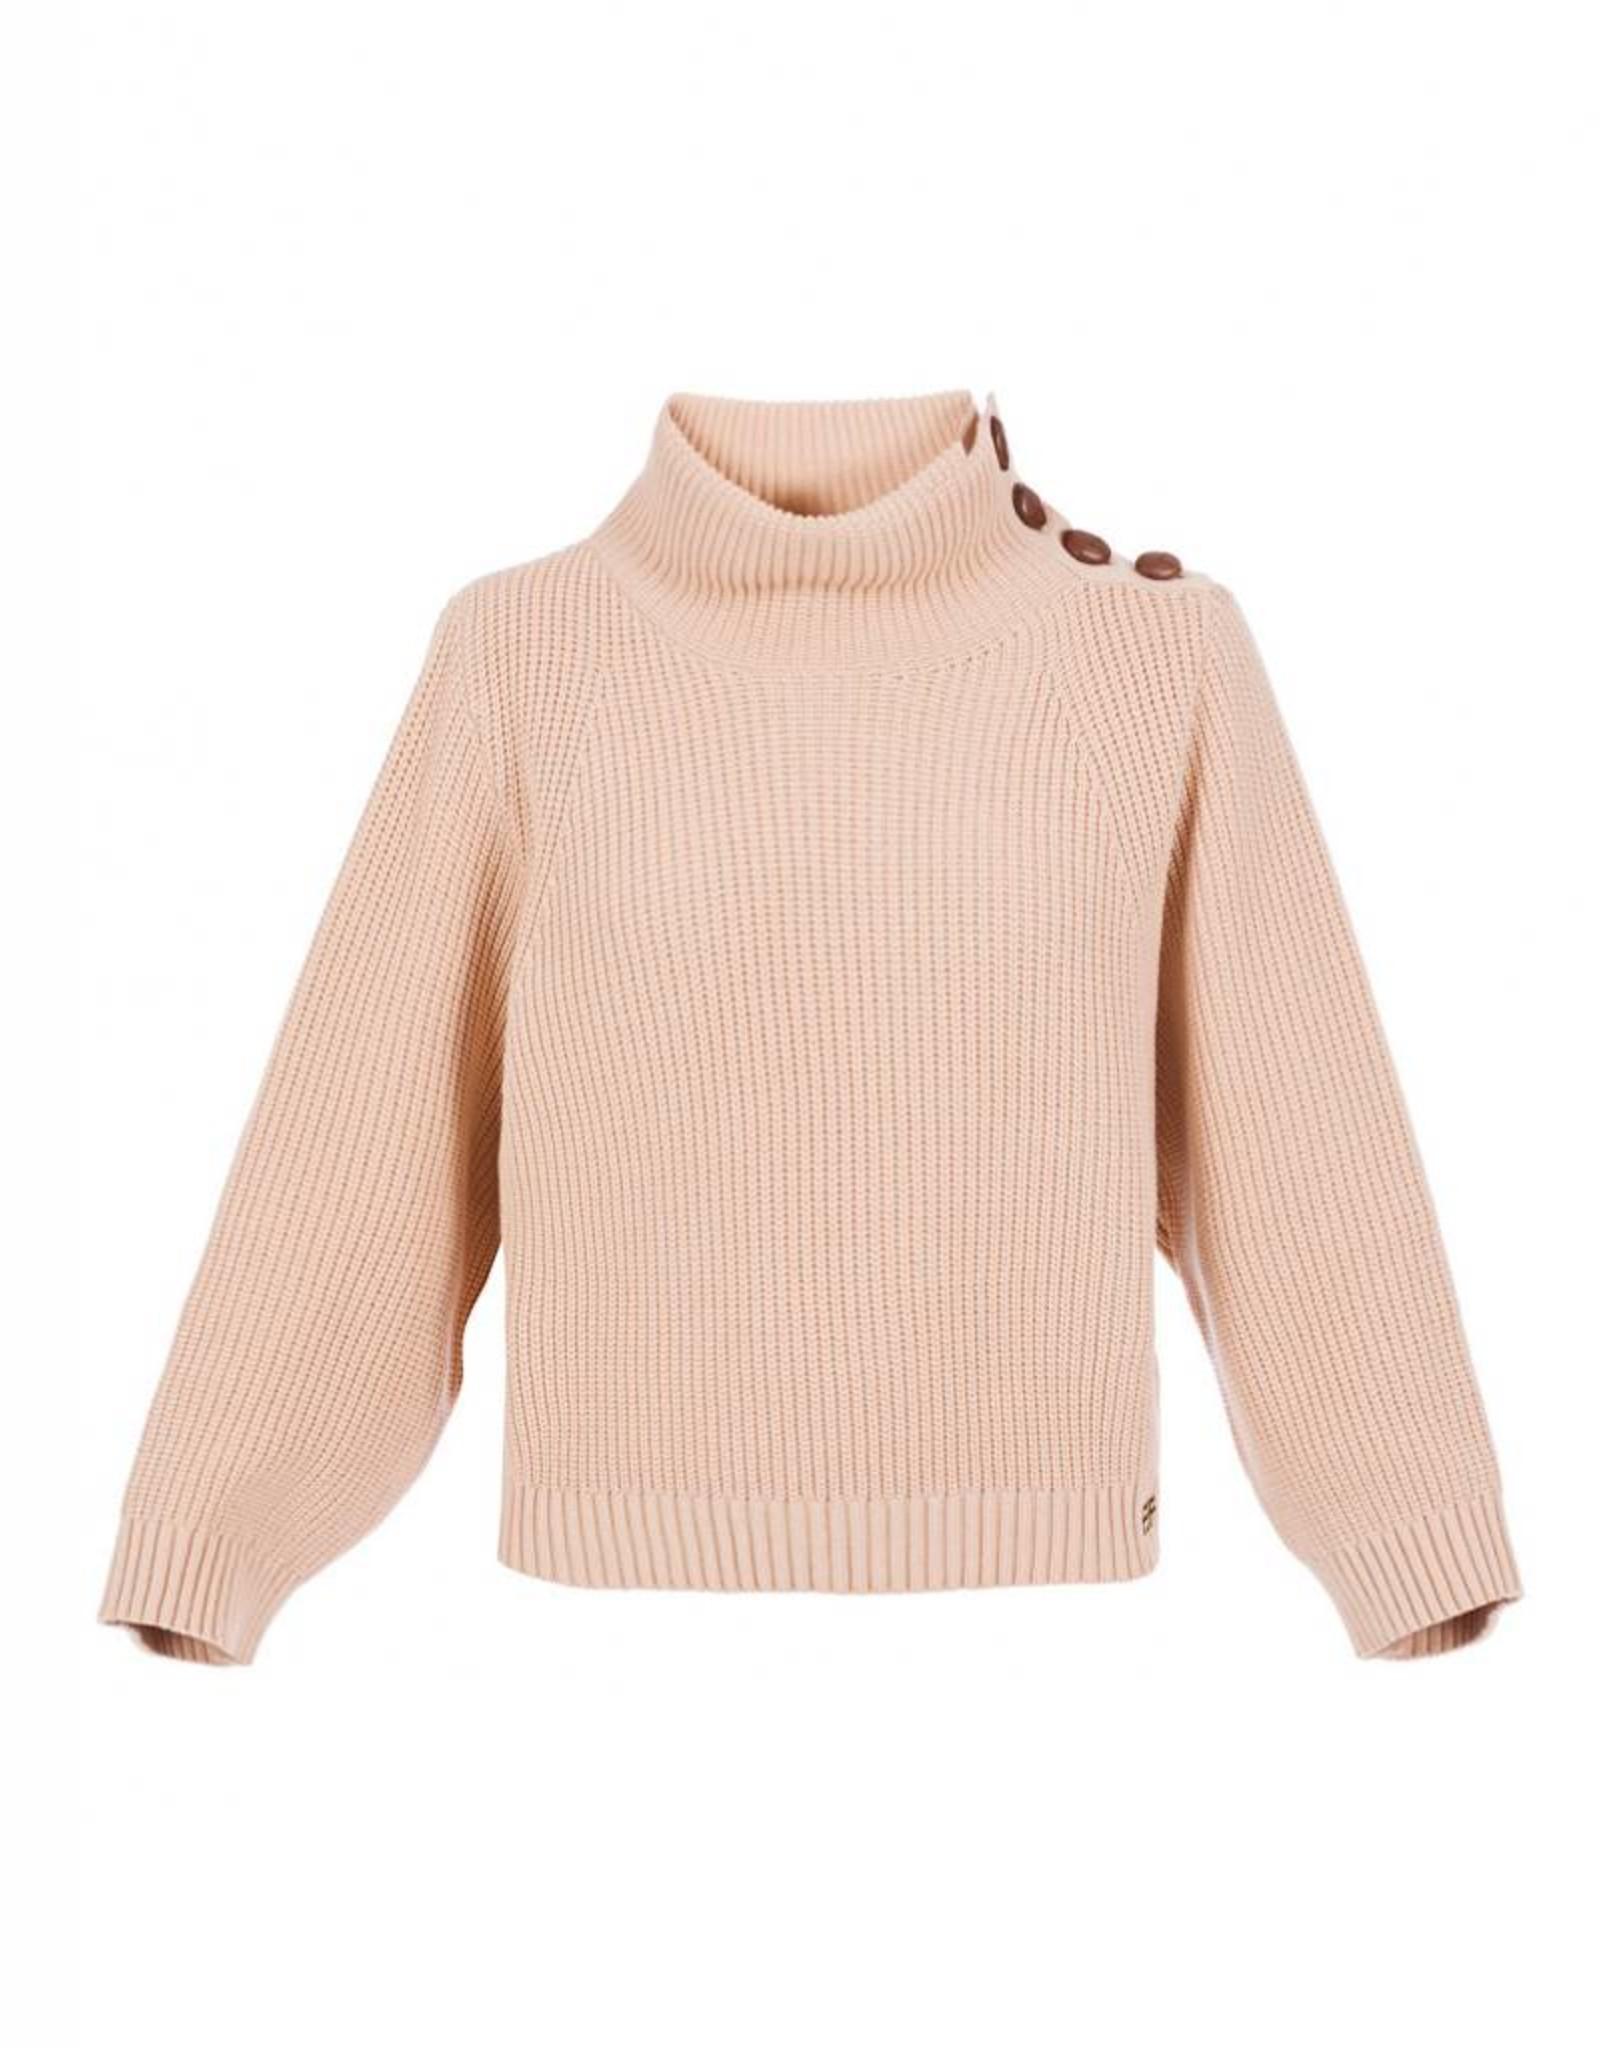 Elisabetta Franchi knitted sweater MK02N86E2